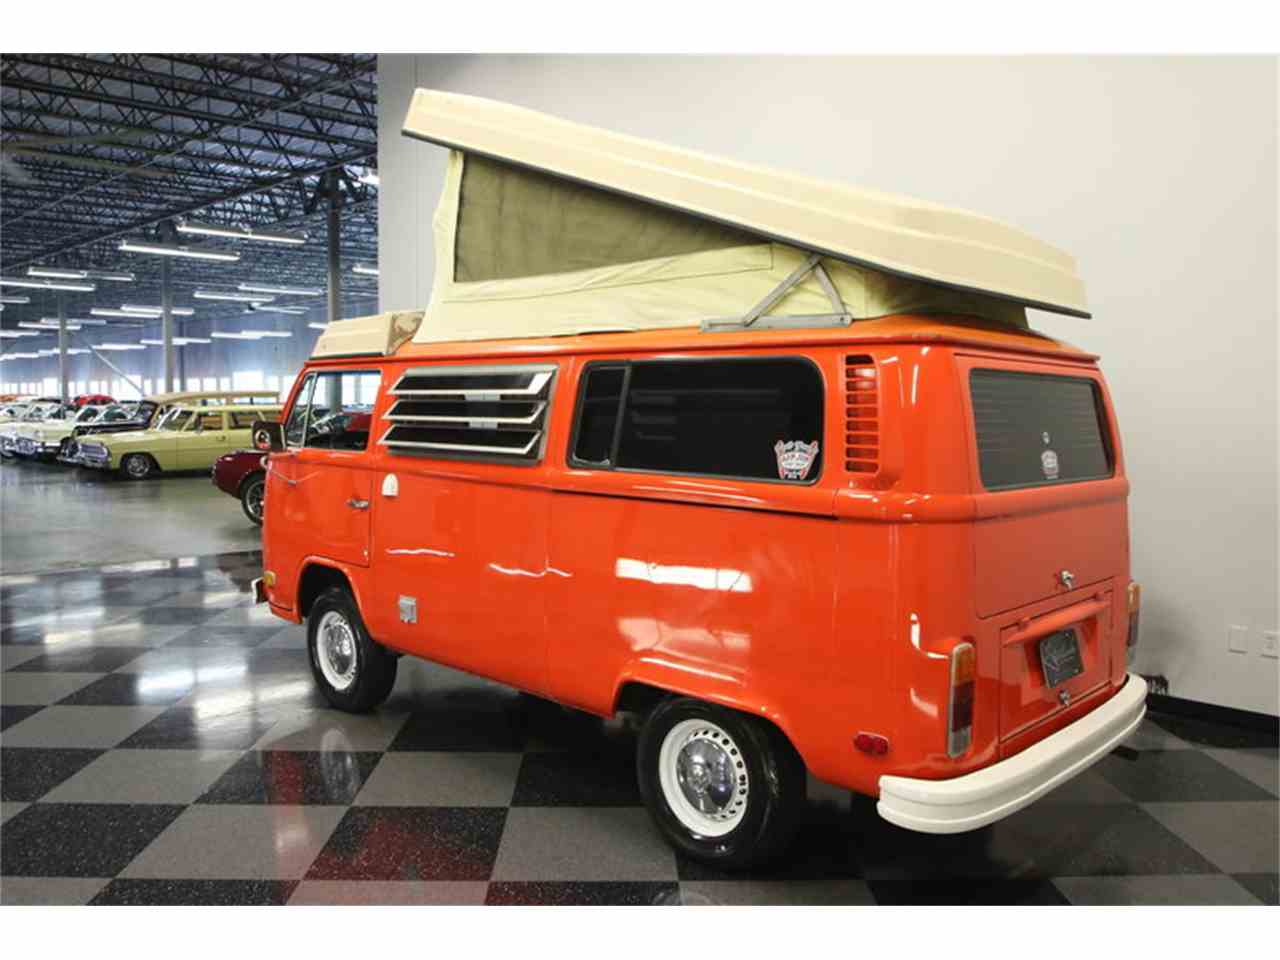 1974 Volkswagen Type 2 Westfalia Camper Van For Sale Classiccars Com Cc 1028317